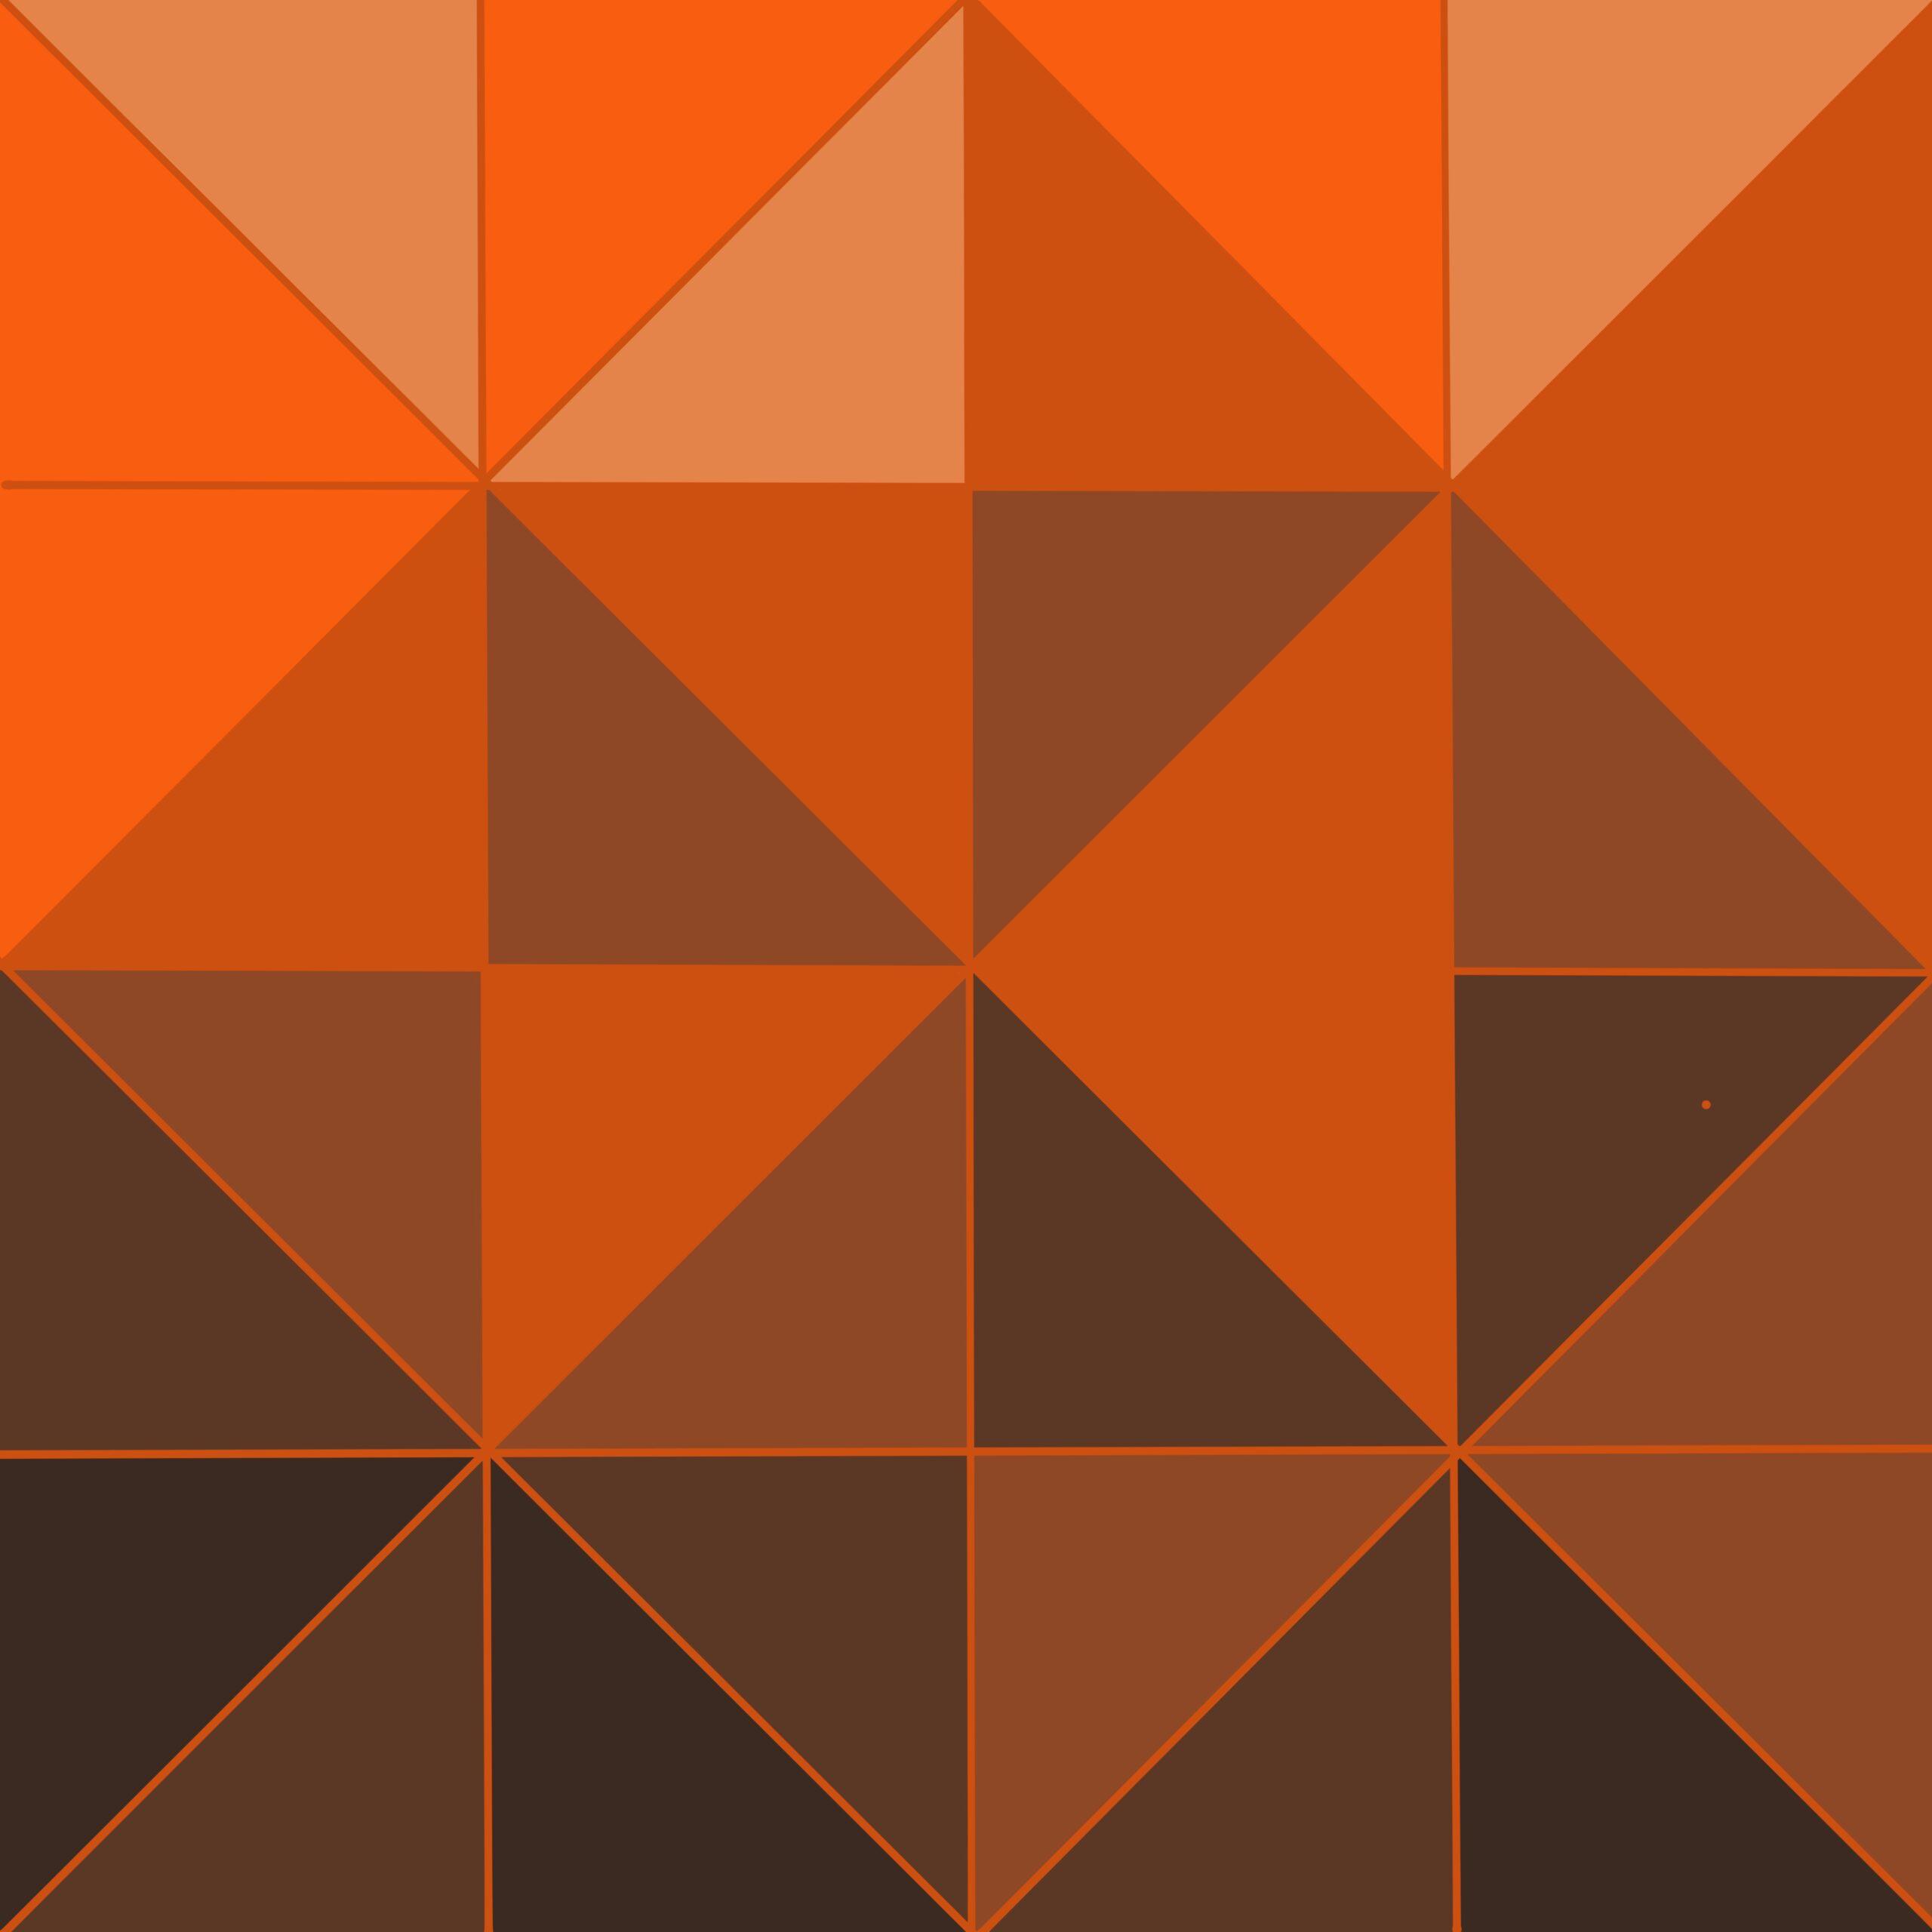 A pattern video